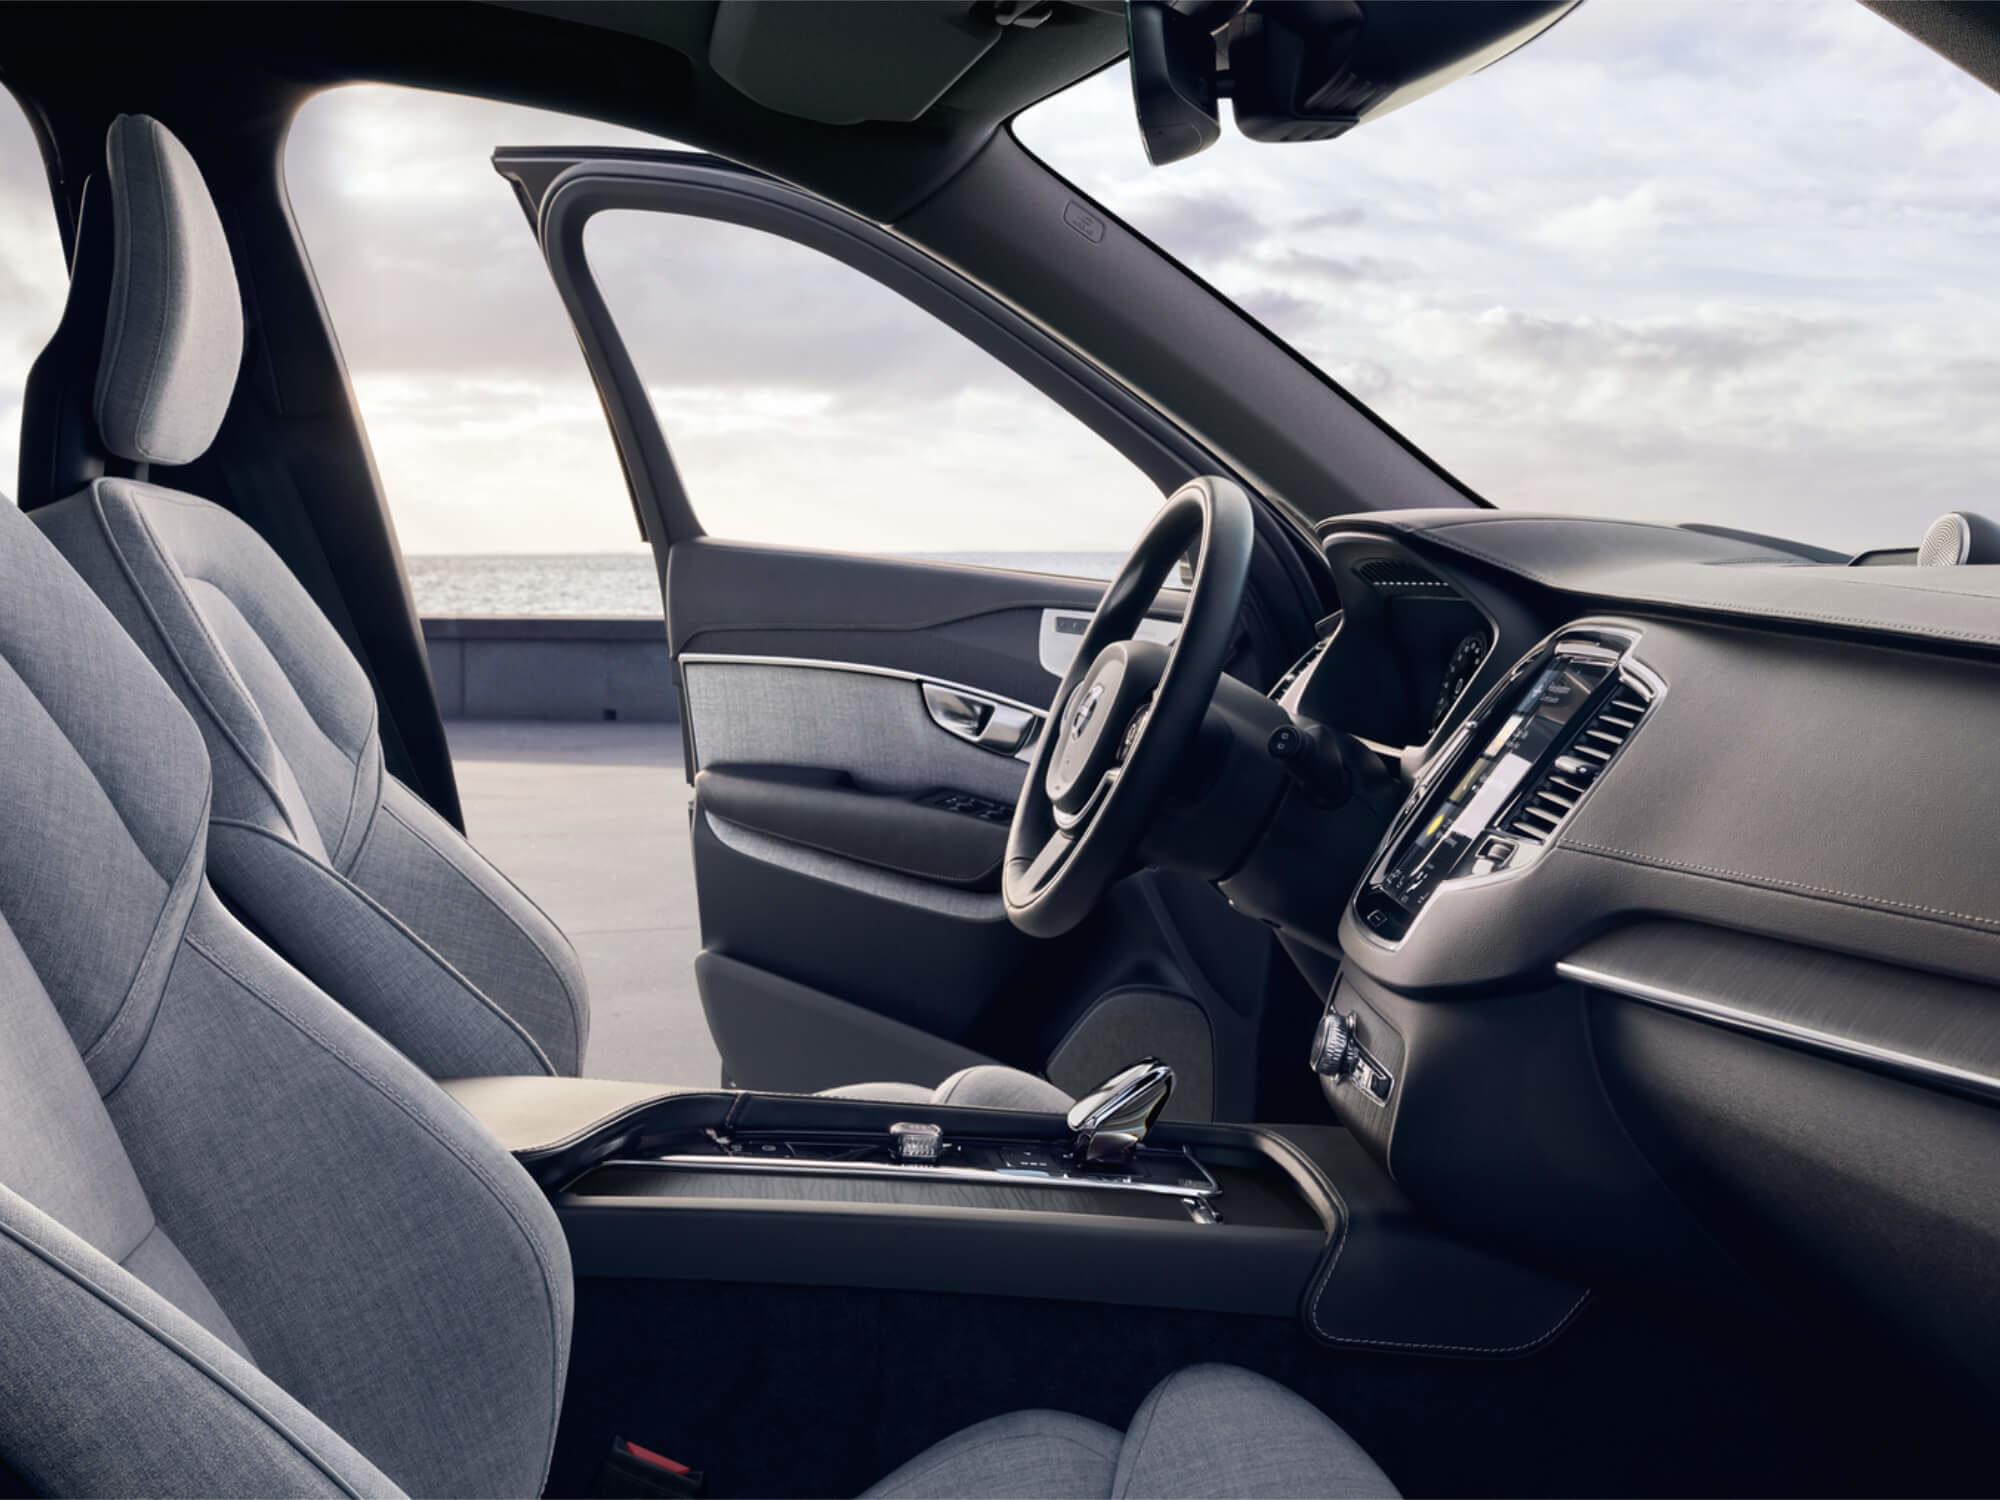 Volvo XC90 Mild Hybrid interieur